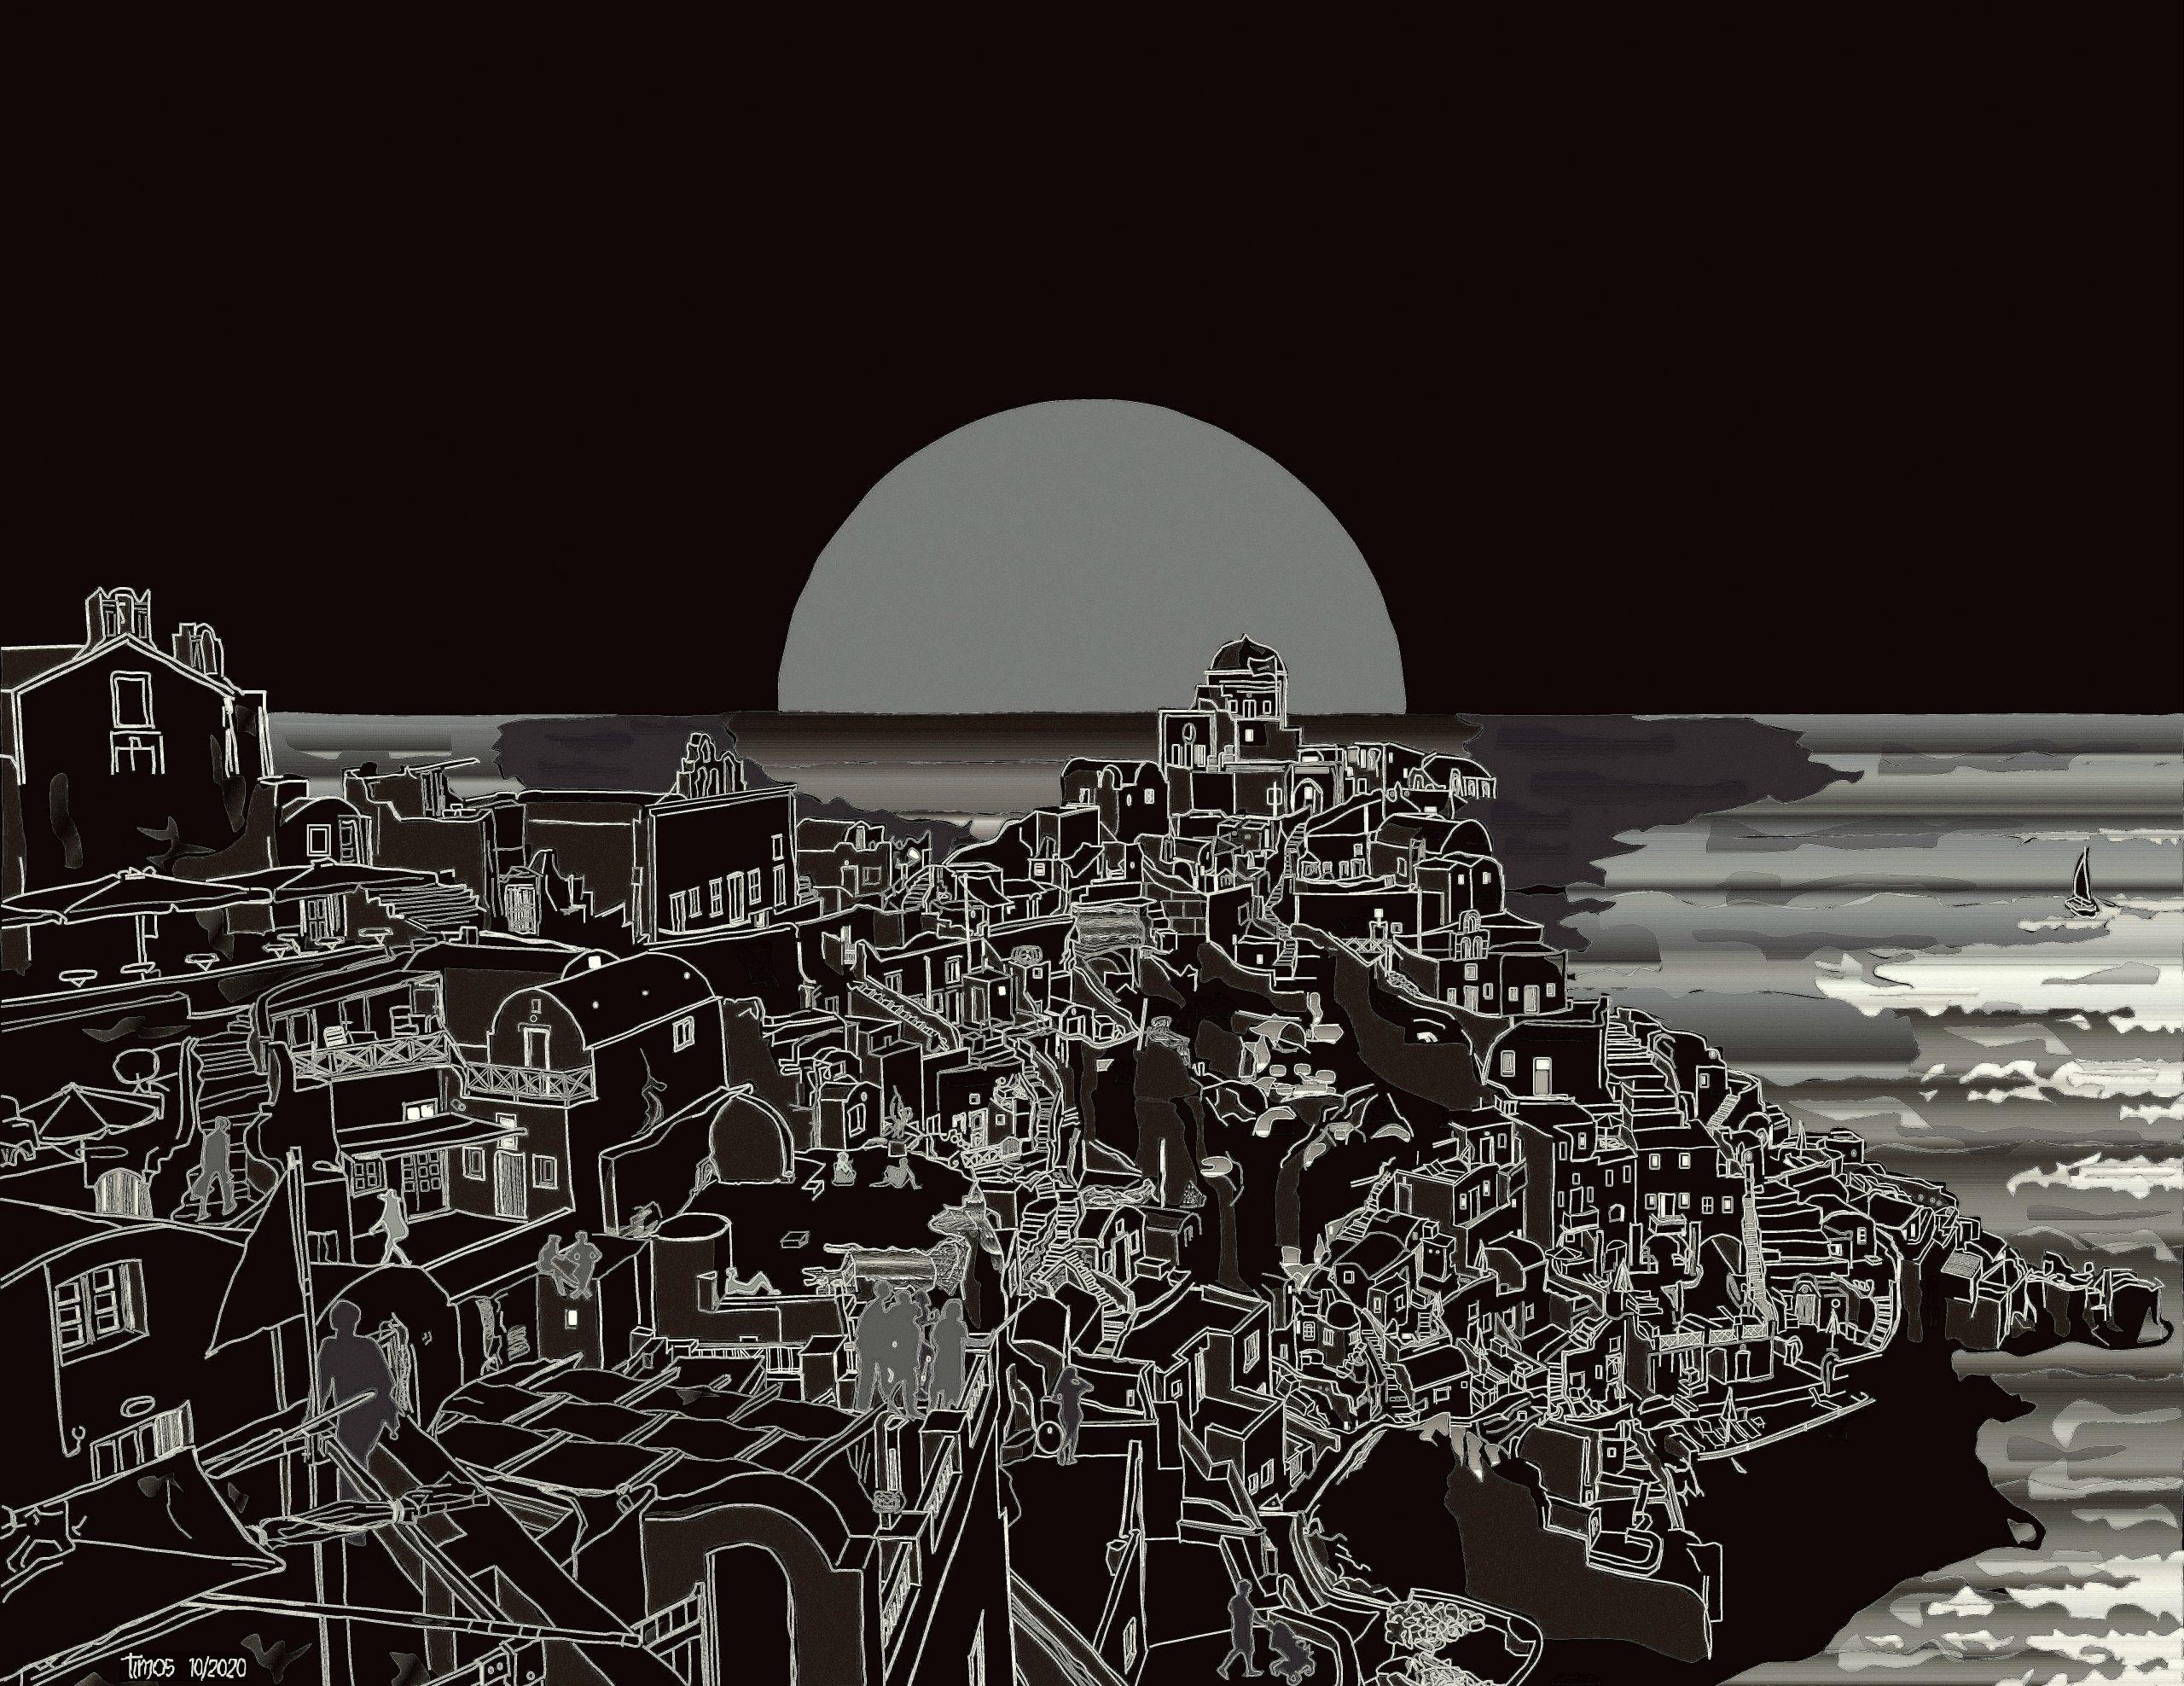 Santorini canvas | 10.23.2020